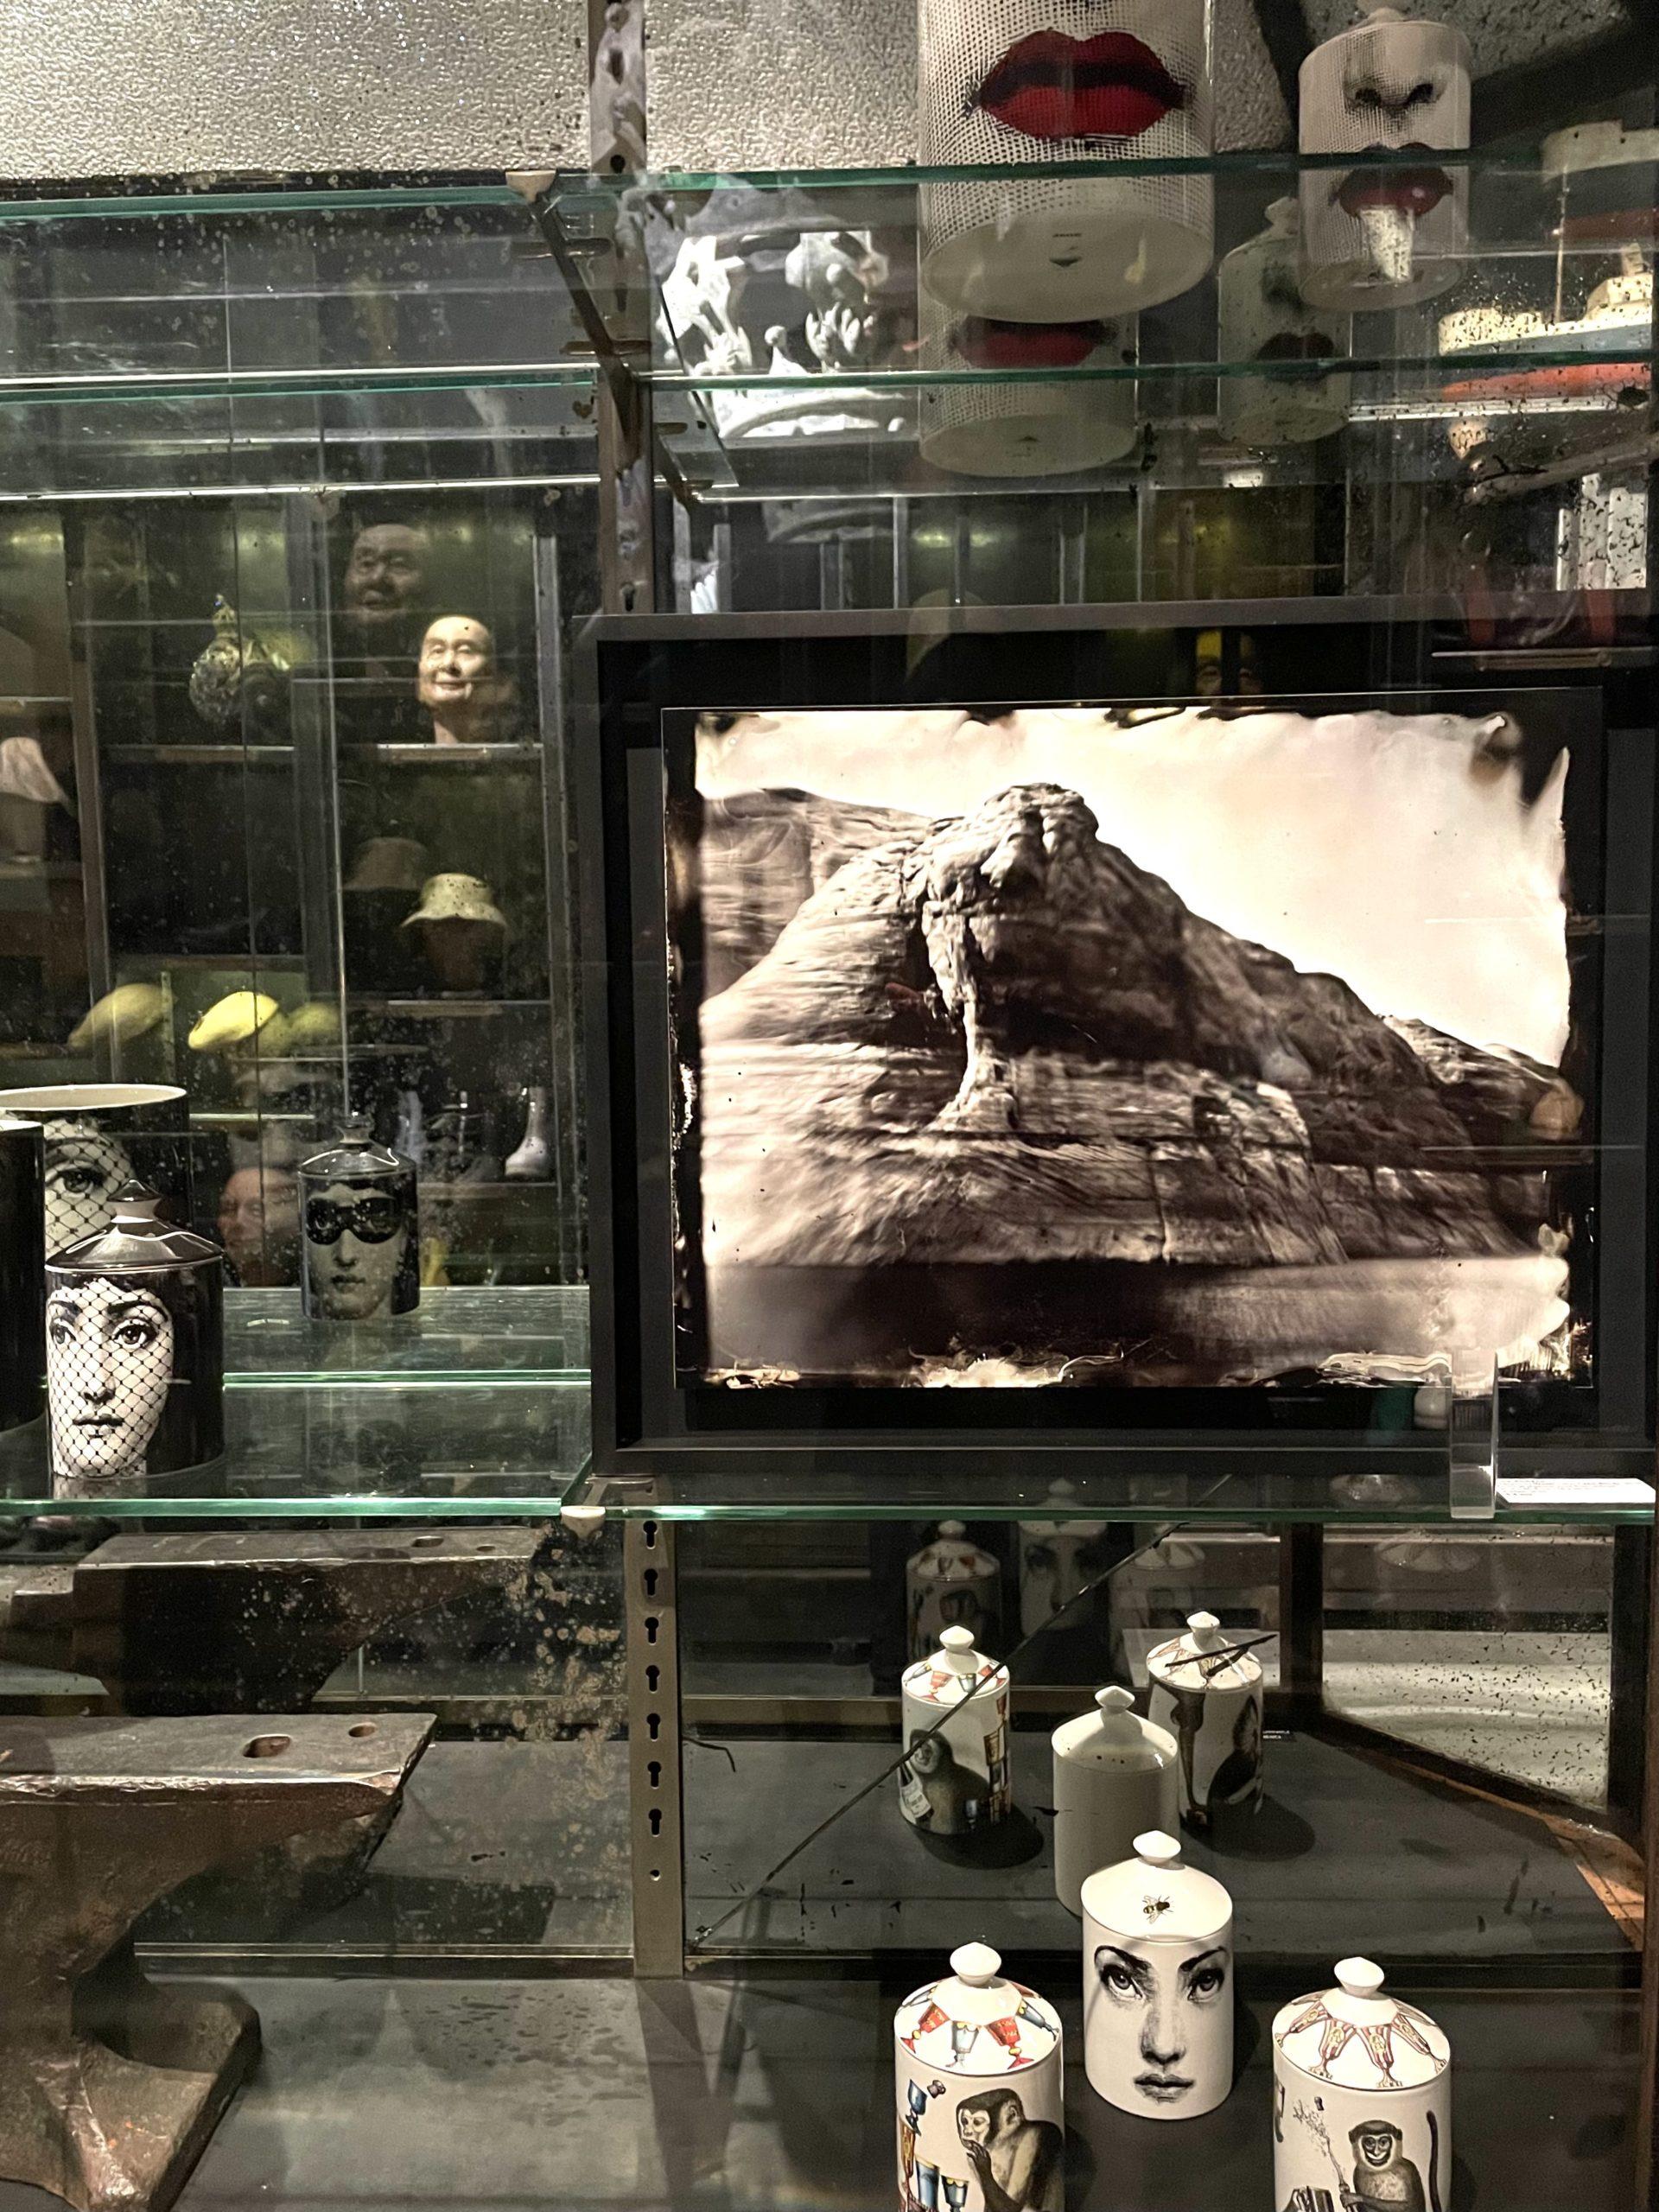 Vue de l'exposition In Si(ght), L'Eclaireur., courtesy Alice Randazzo